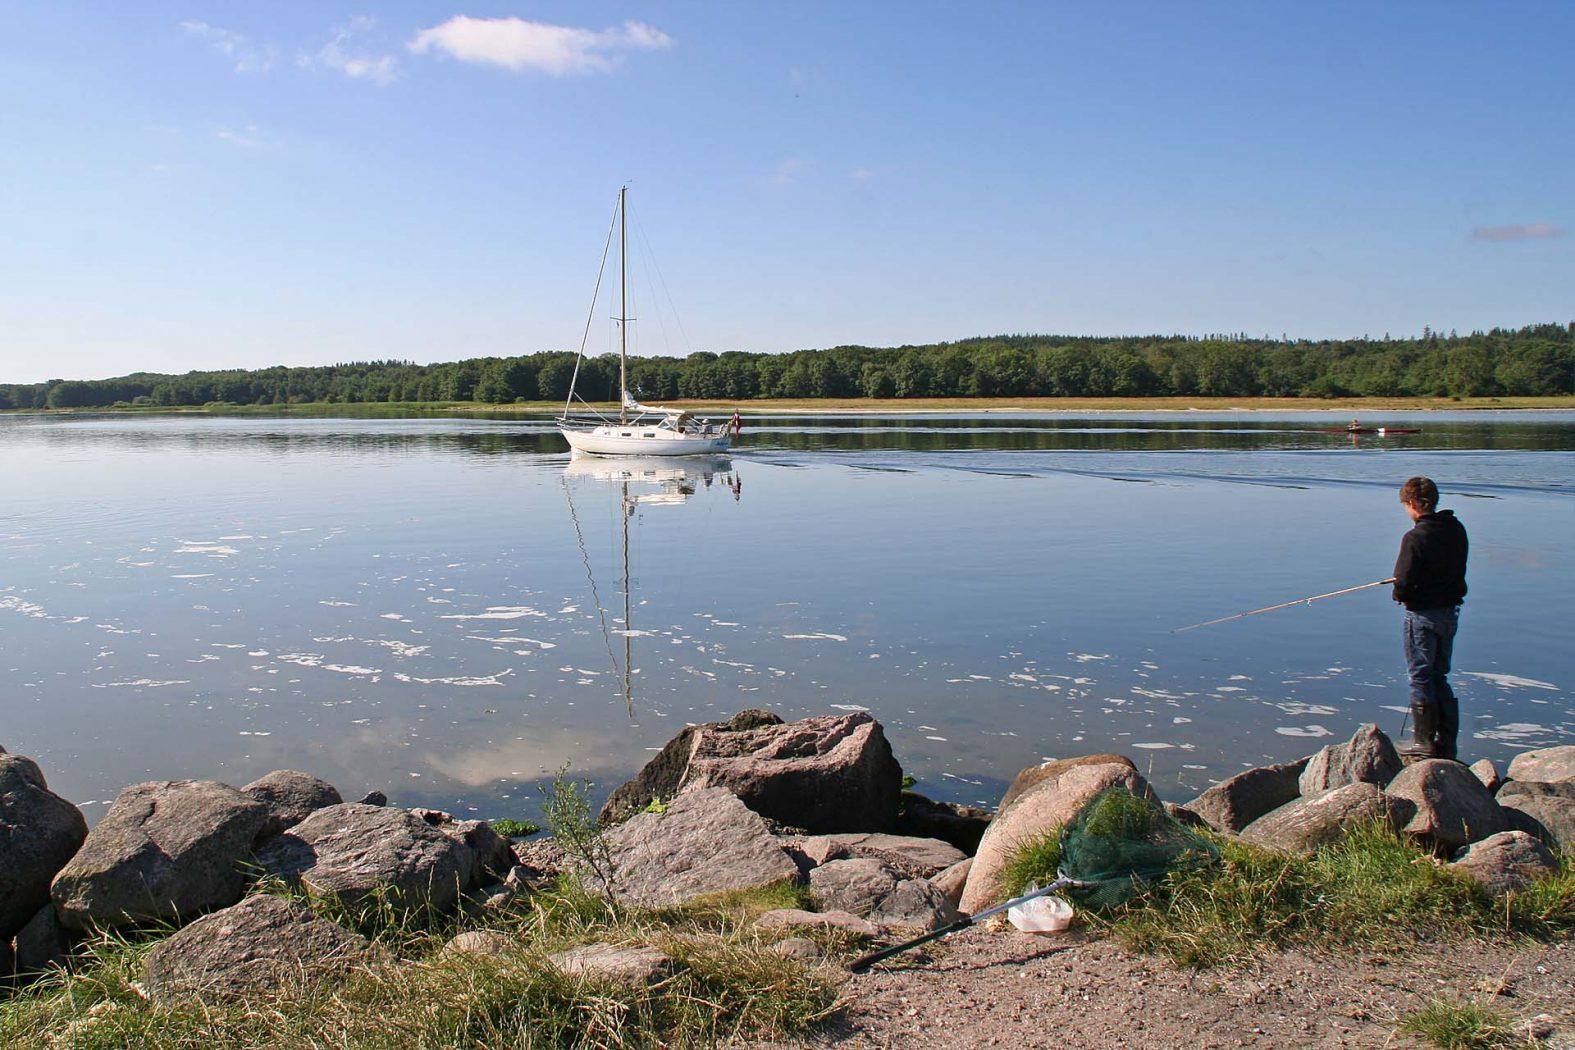 Angelplatz Havnø Mole am Mariagerfjord